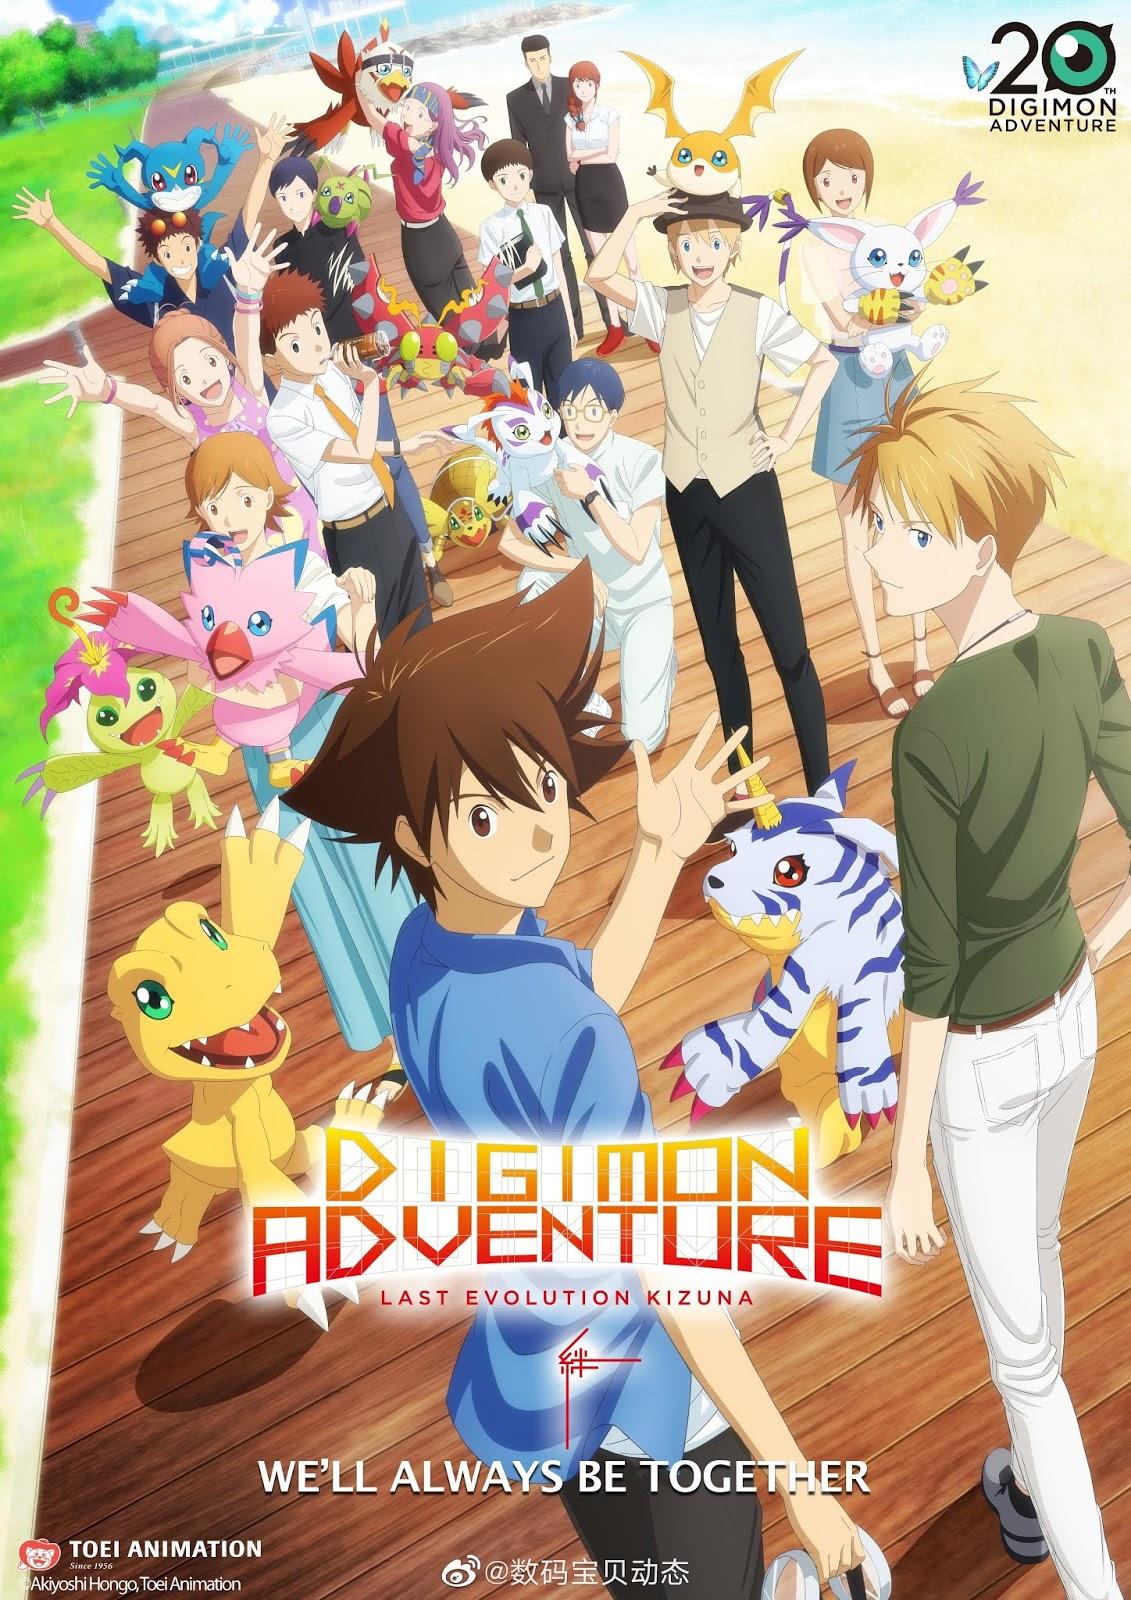 Digimon Adventure Last Evolution Kizuna BD [Movie] Batch Subtitle Indonesia [x265]